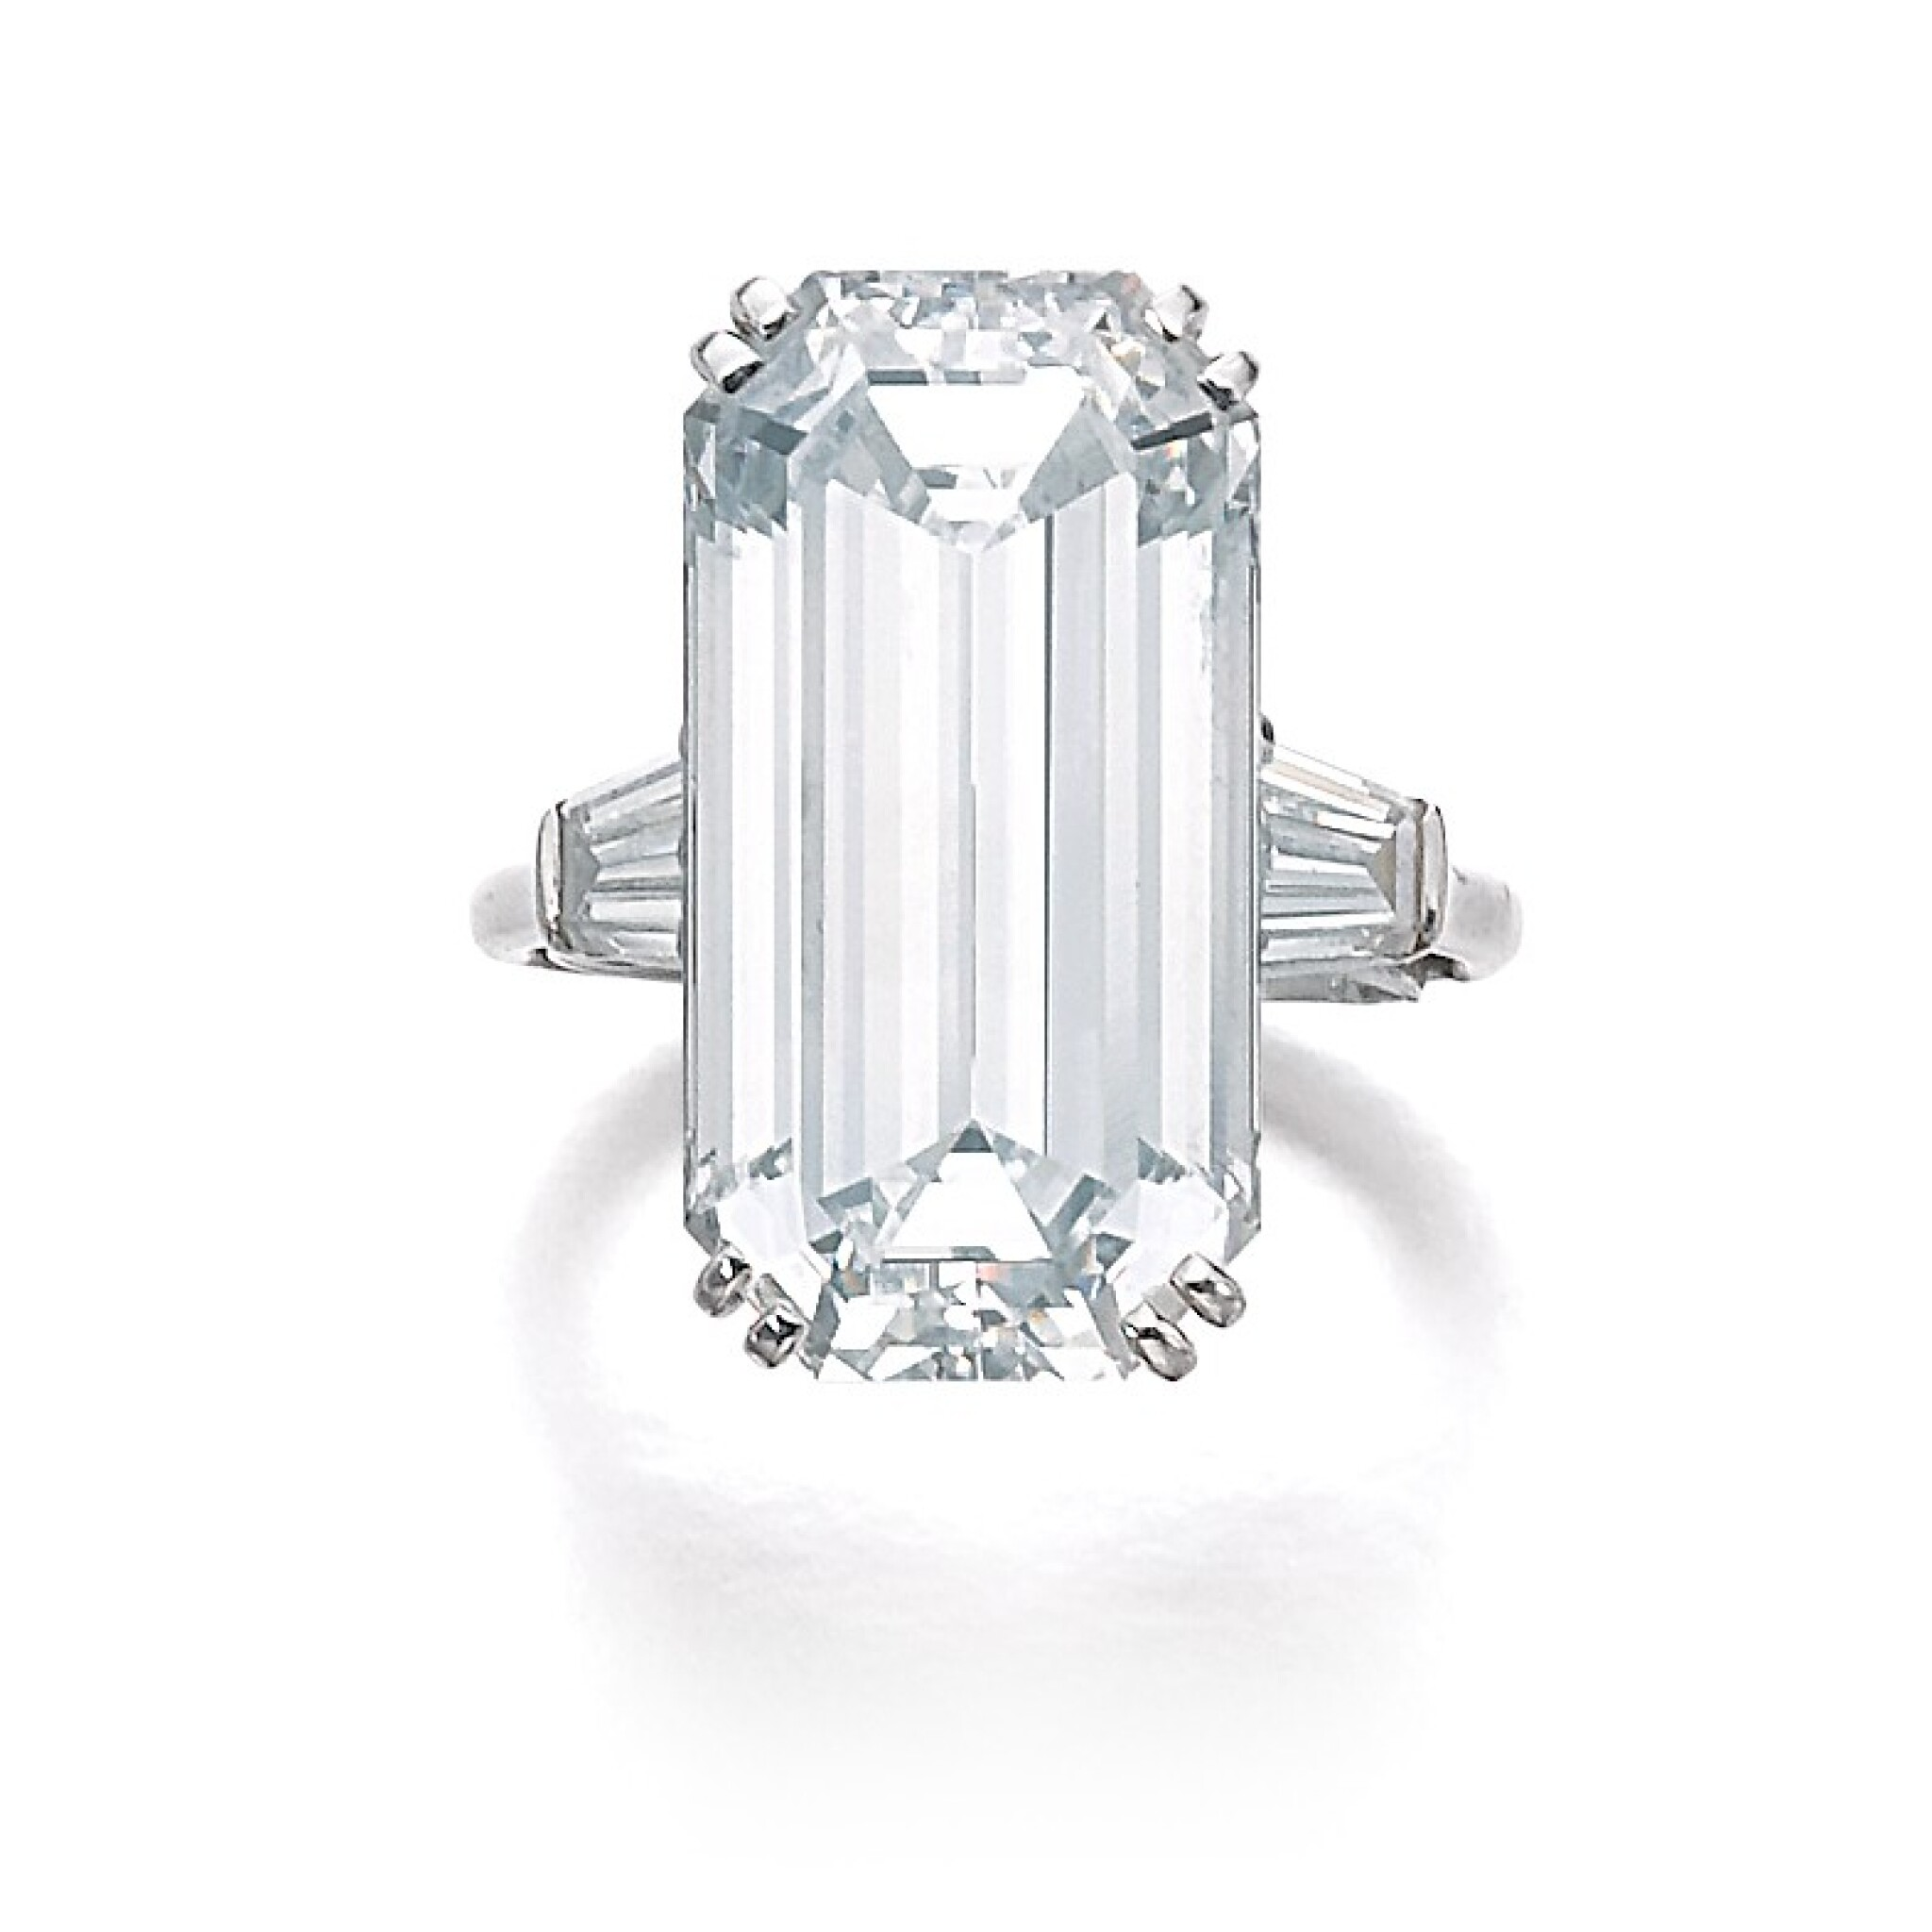 View full screen - View 1 of Lot 200. HARRY WINSTON [海瑞溫斯頓]   FINE DIAMOND RING, 1968 [鑽石戒指,1968年].